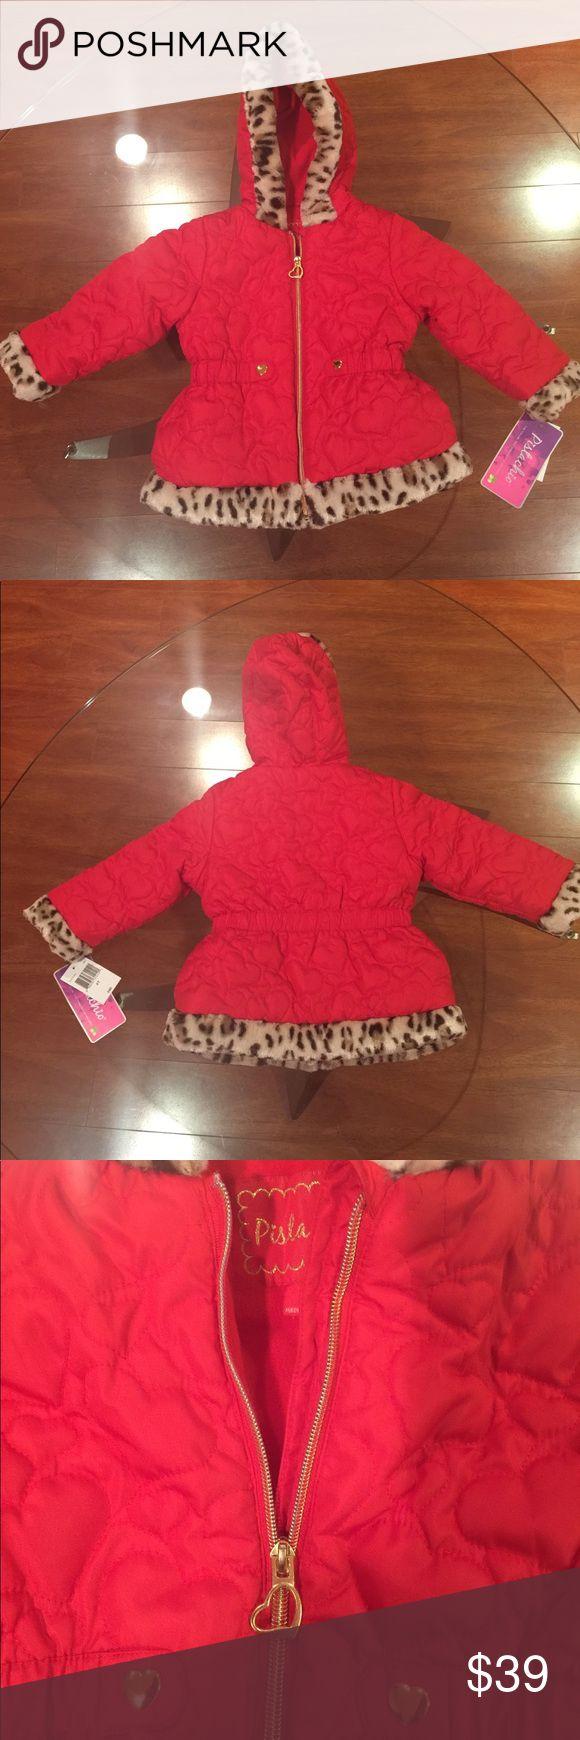 Pistachio jacket for the girl. Pistachio jacket for the girl. Brand new, with tags. pistachio Jackets & Coats Puffers